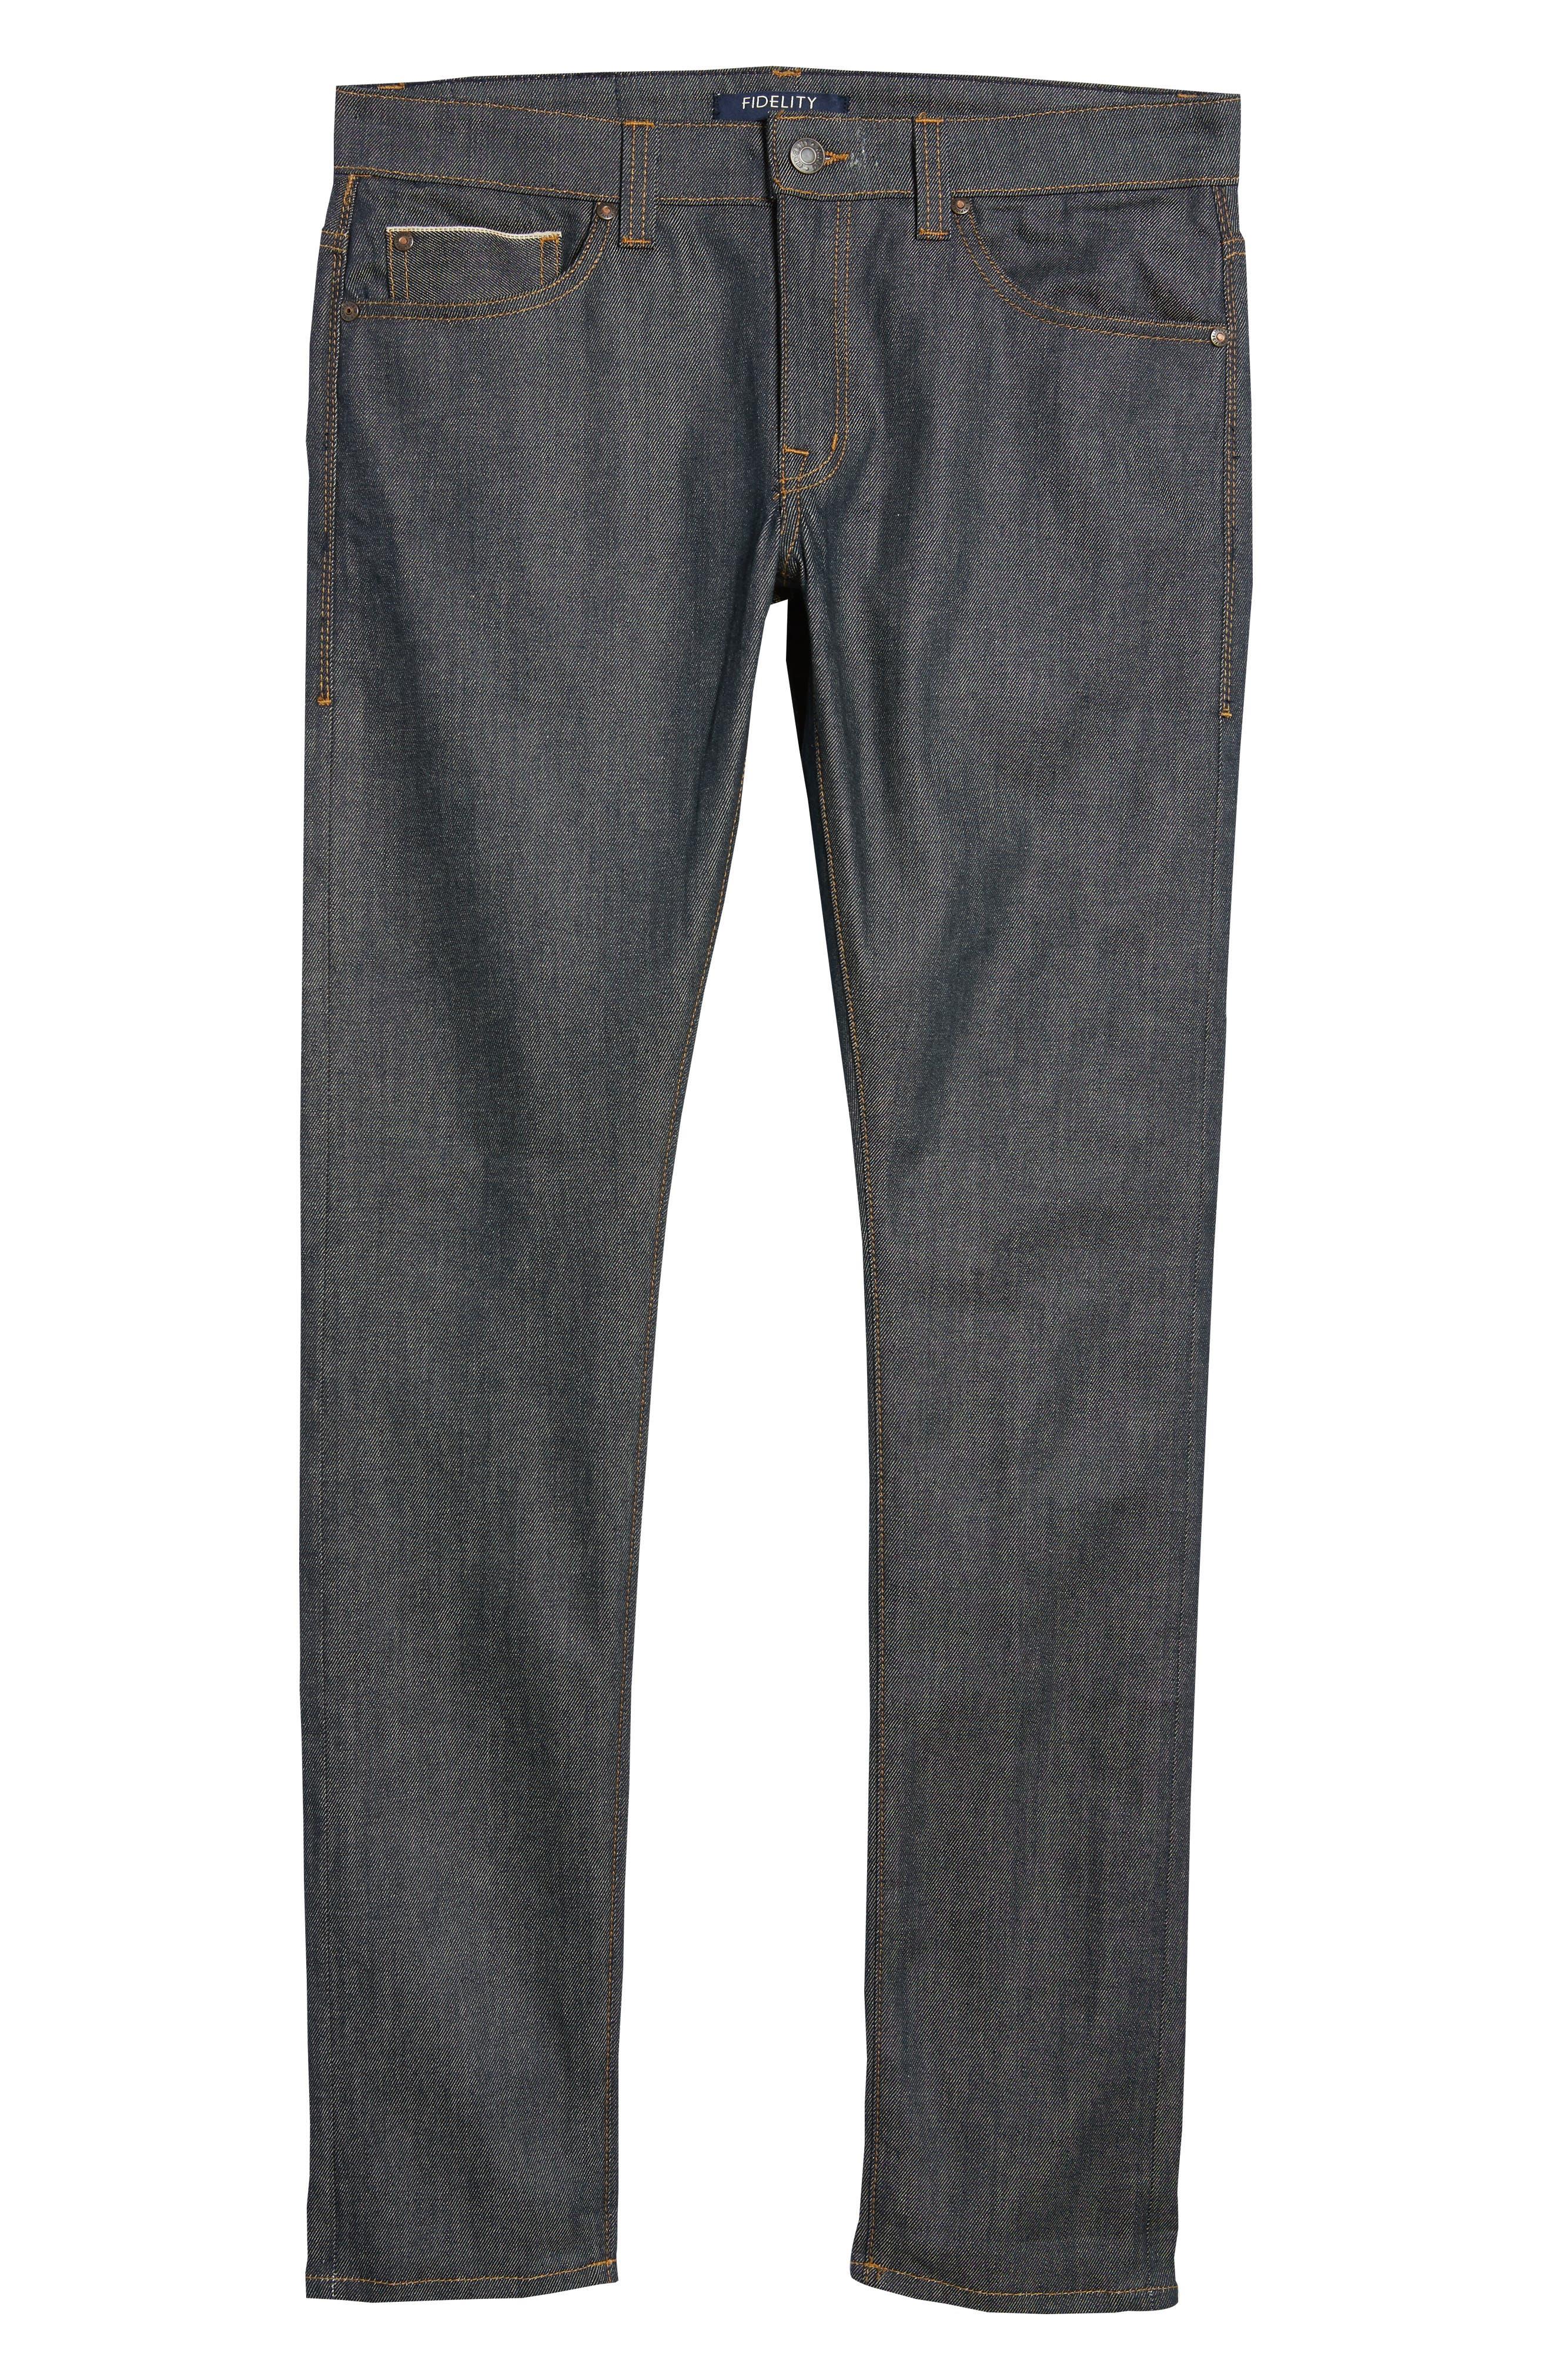 Torino Slim Fit Jeans,                             Alternate thumbnail 6, color,                             Richmond